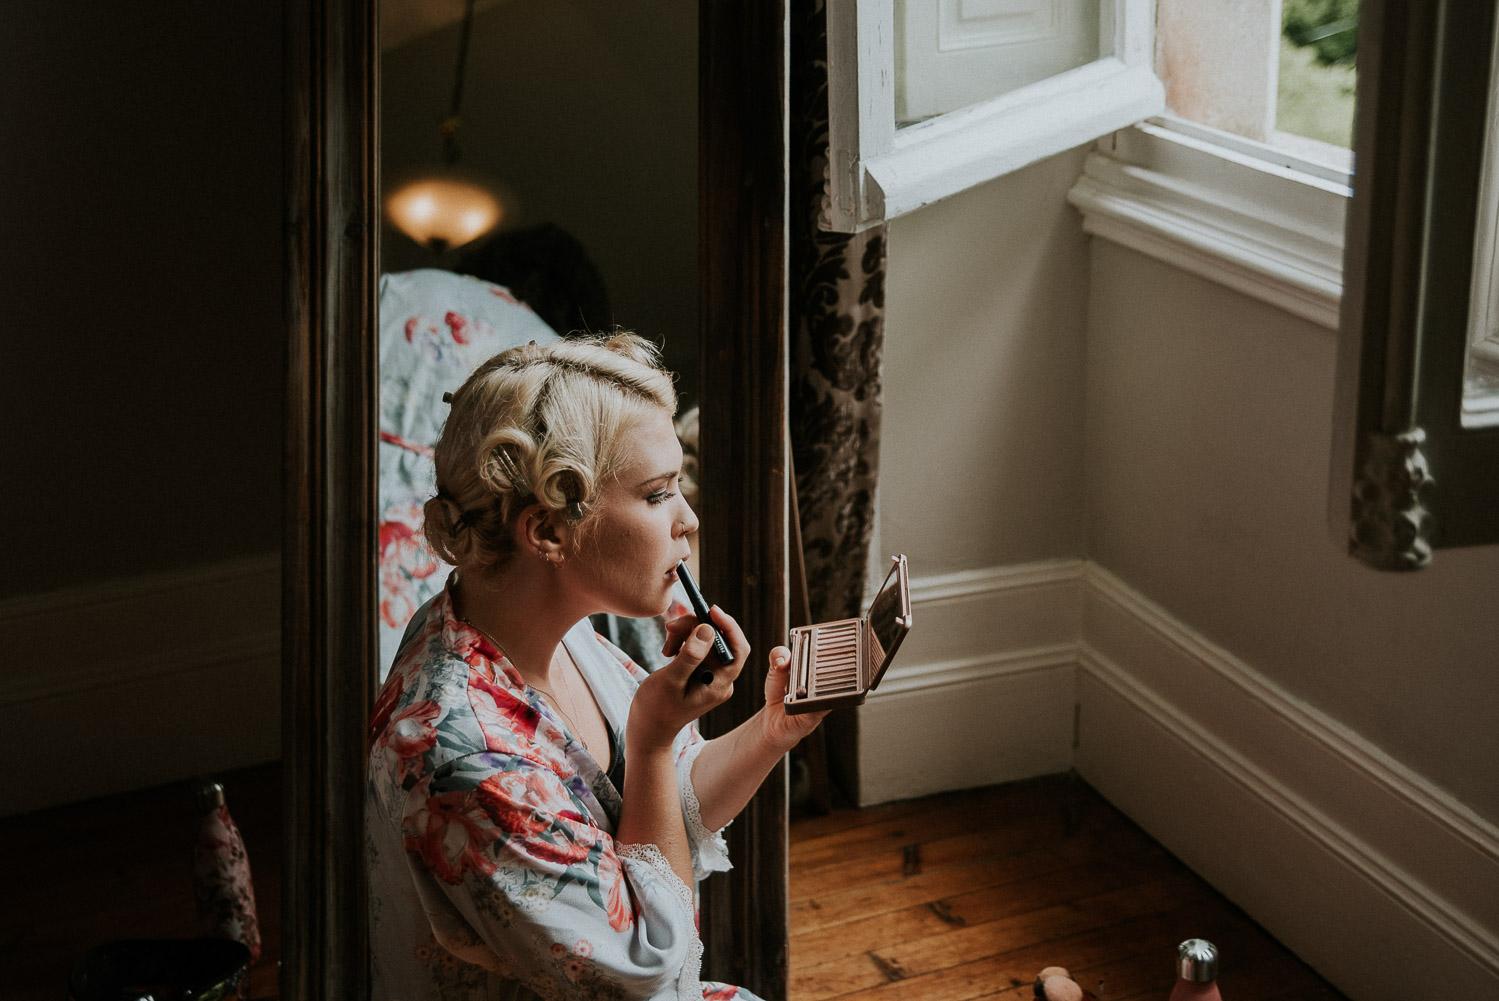 chateau_de_lisse_gers_wedding_katy_webb_photography_france_UK10